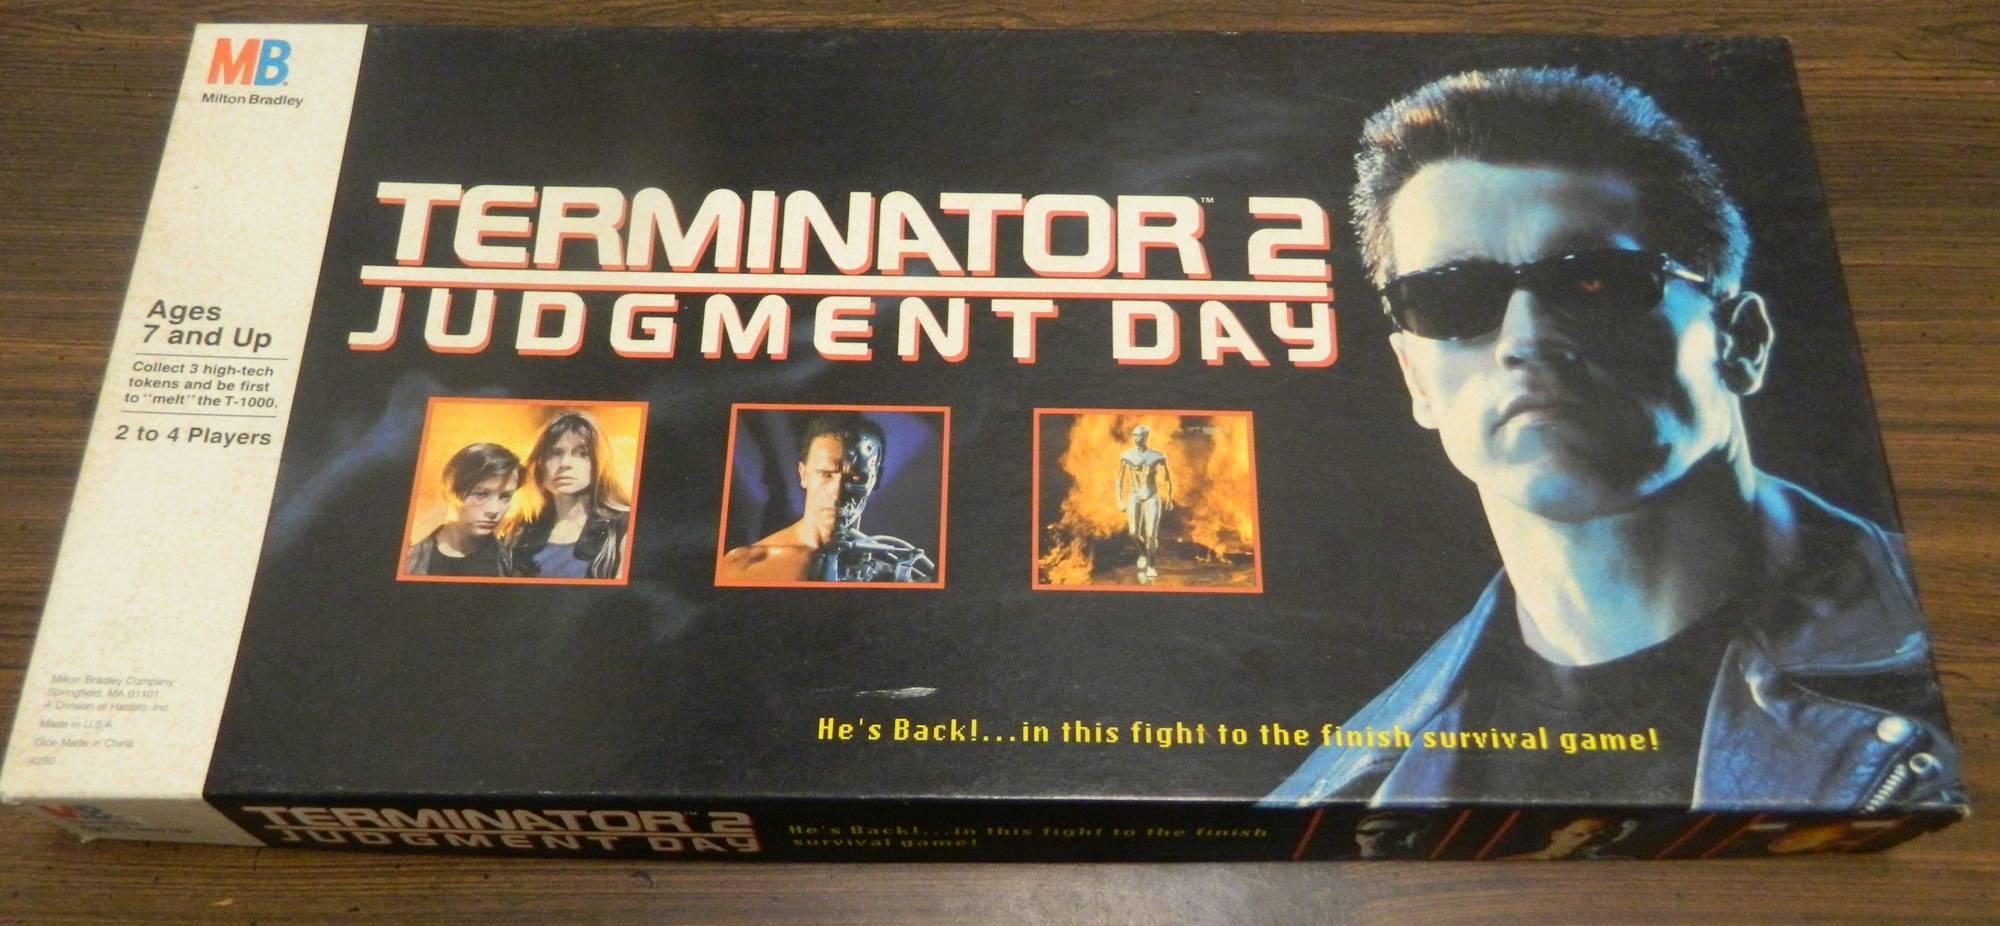 Terminator 2 Judgment Day Box